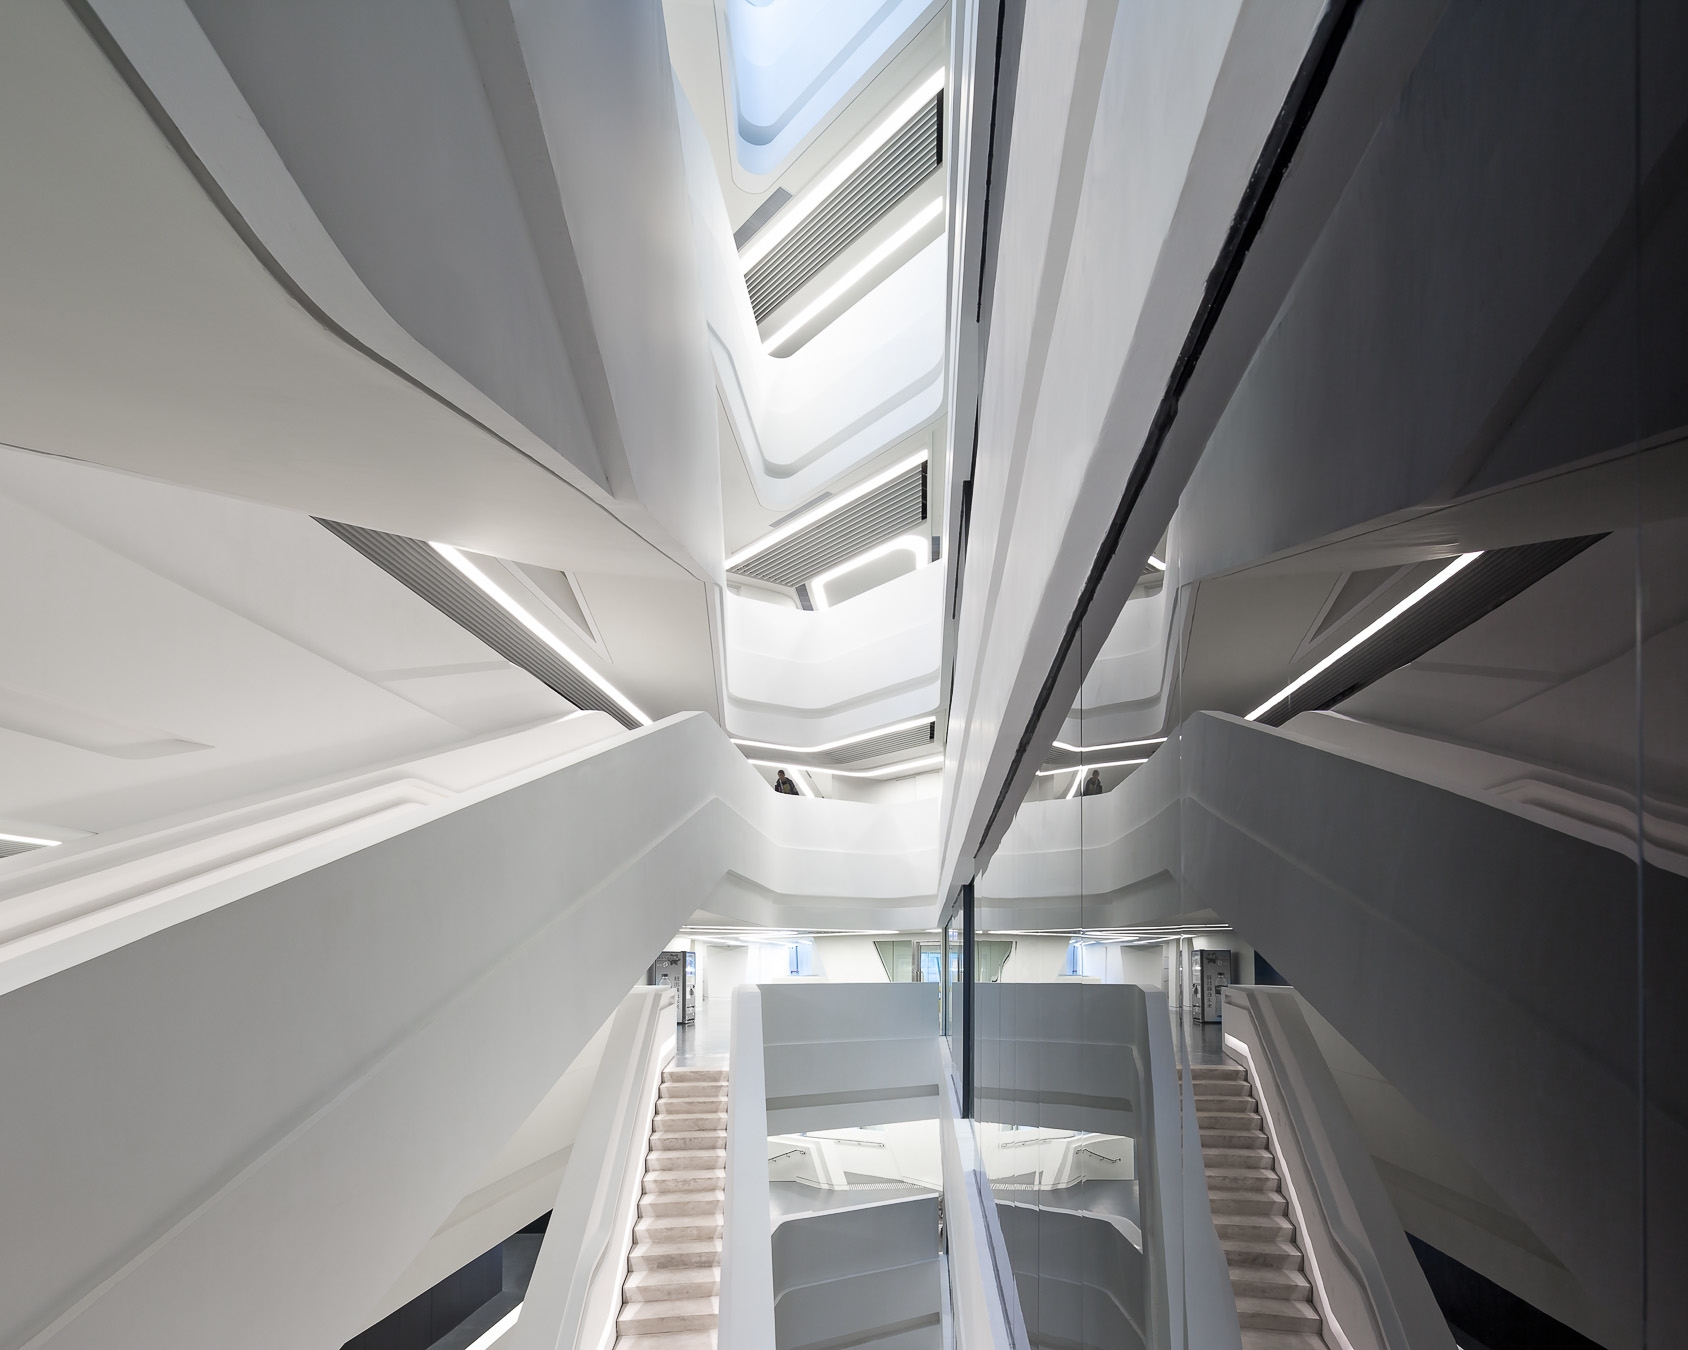 doublespace_innovation_tower_hong_kong_zaha_hadid_architects-56.jpg